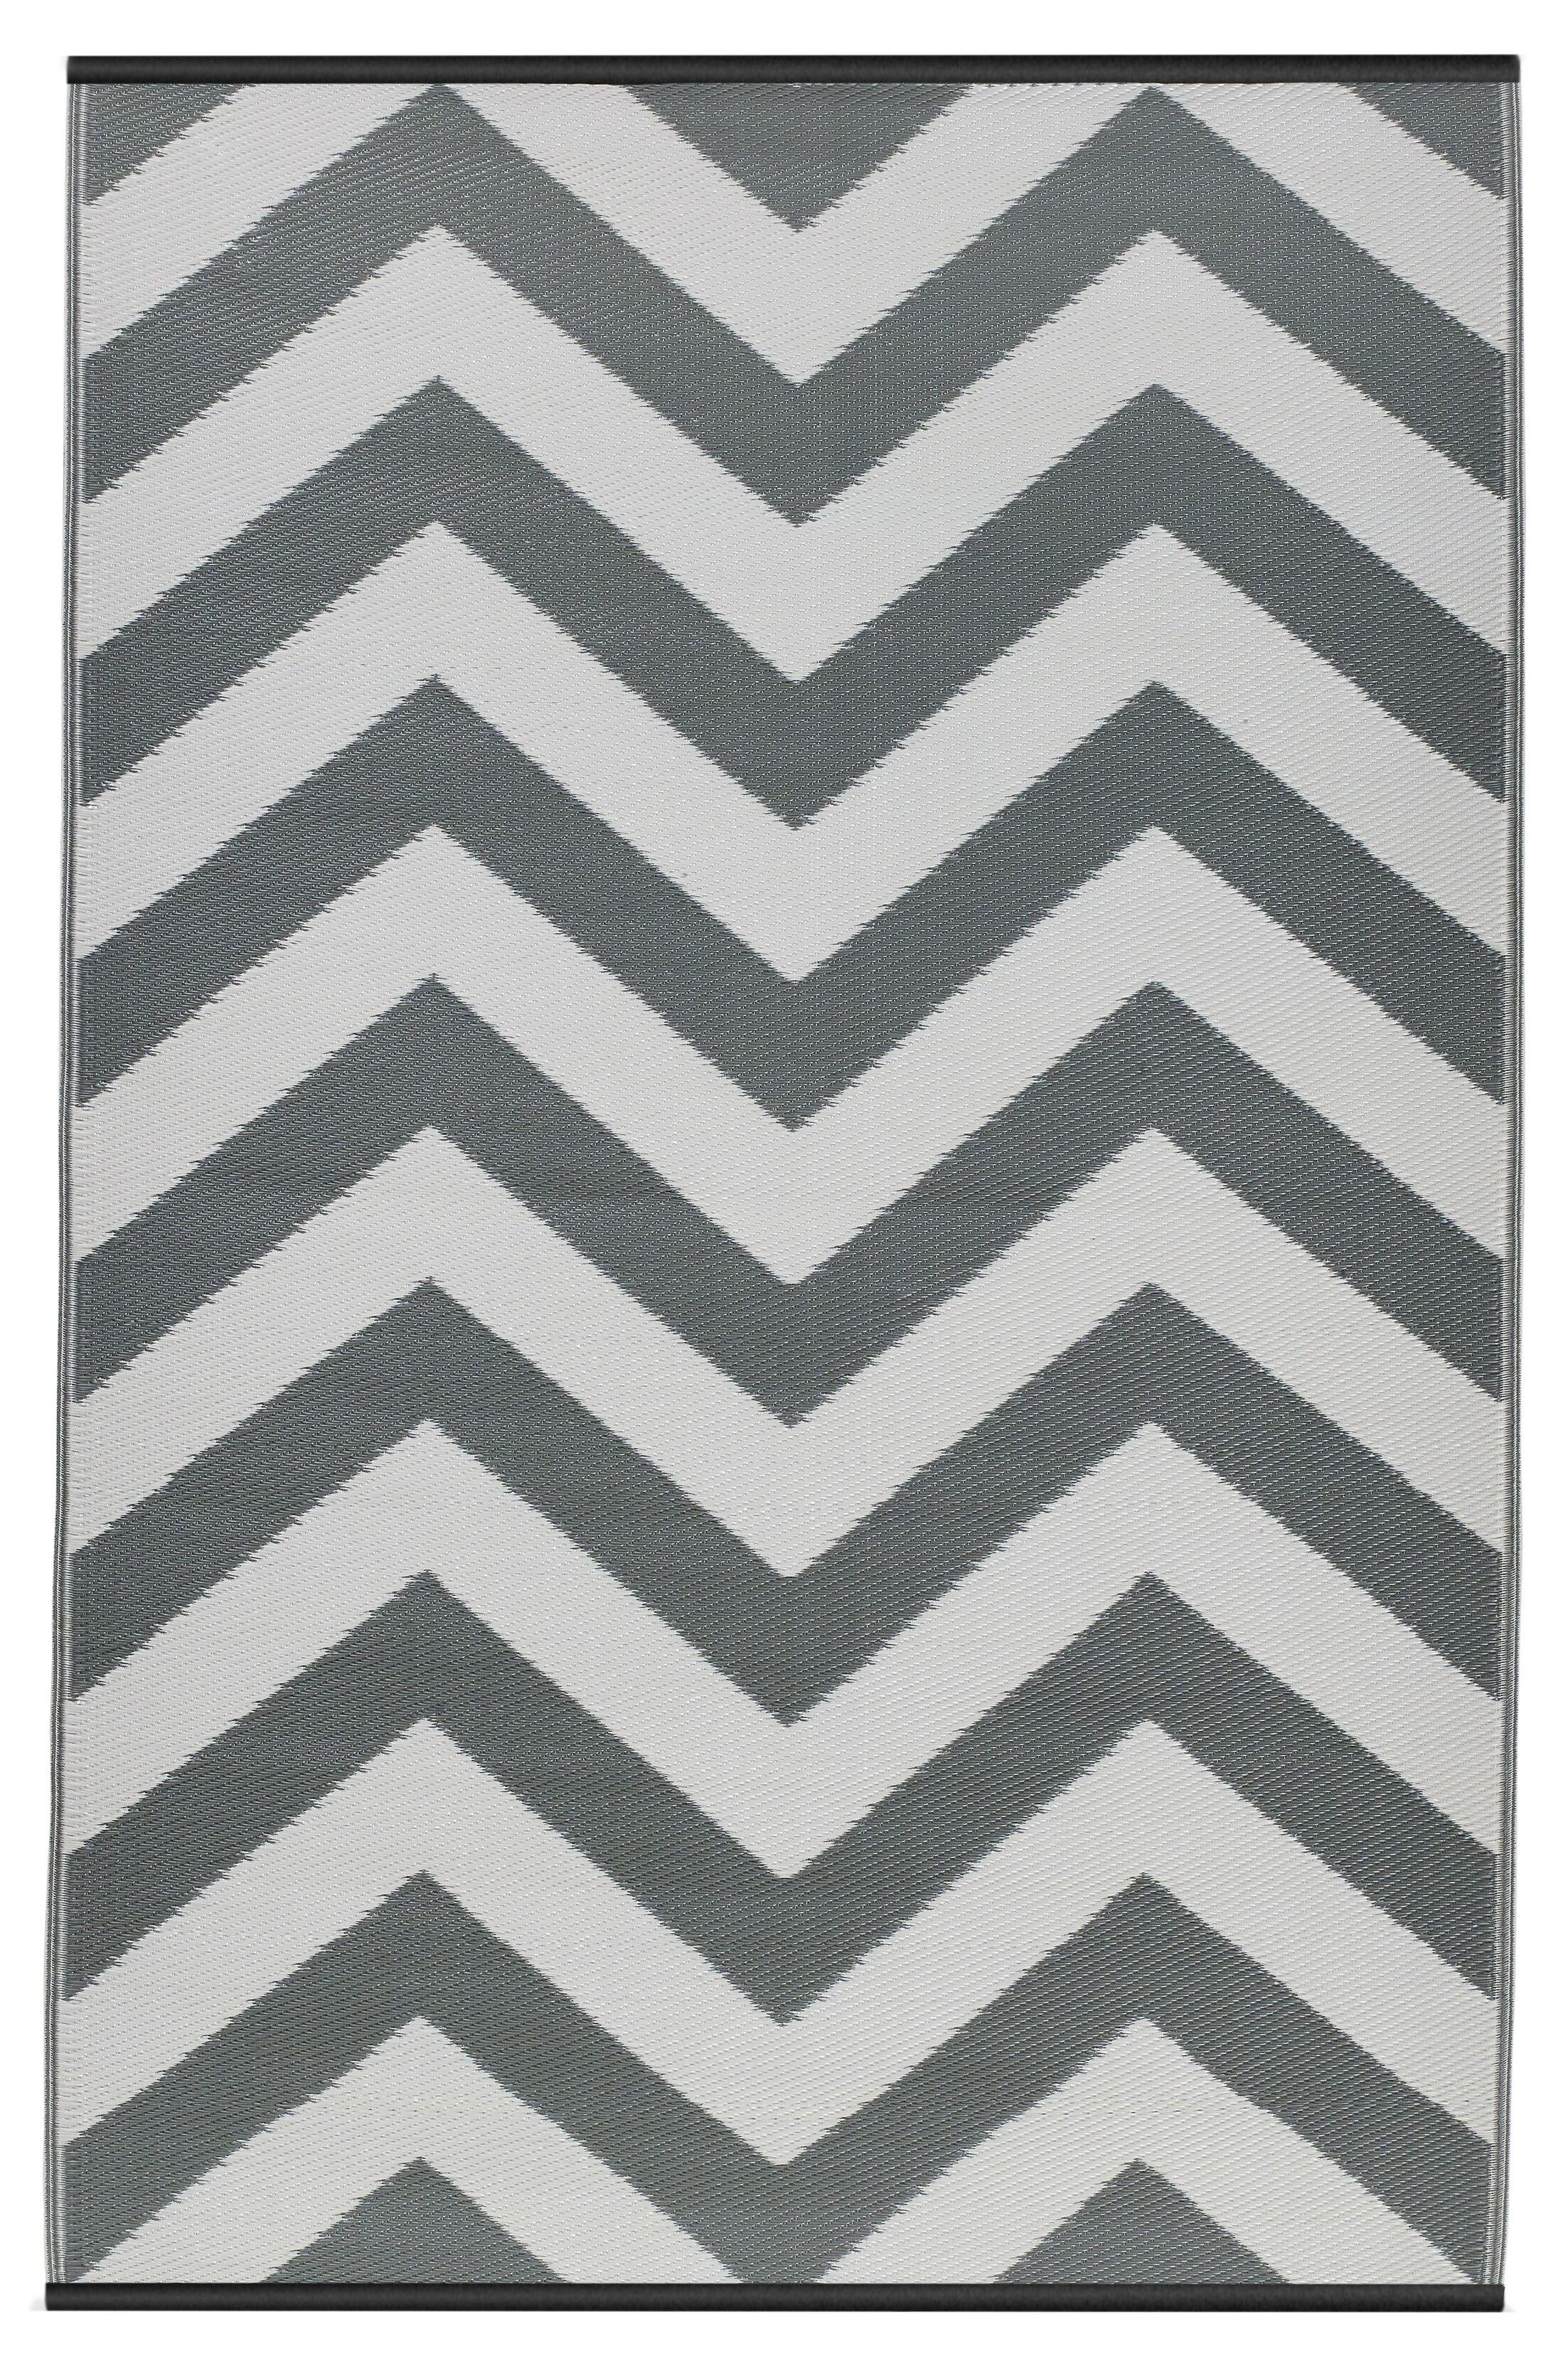 Reva Hand Woven Gray/White Indoor/Outdoor Area Rug Rug Size: 5' x 8'